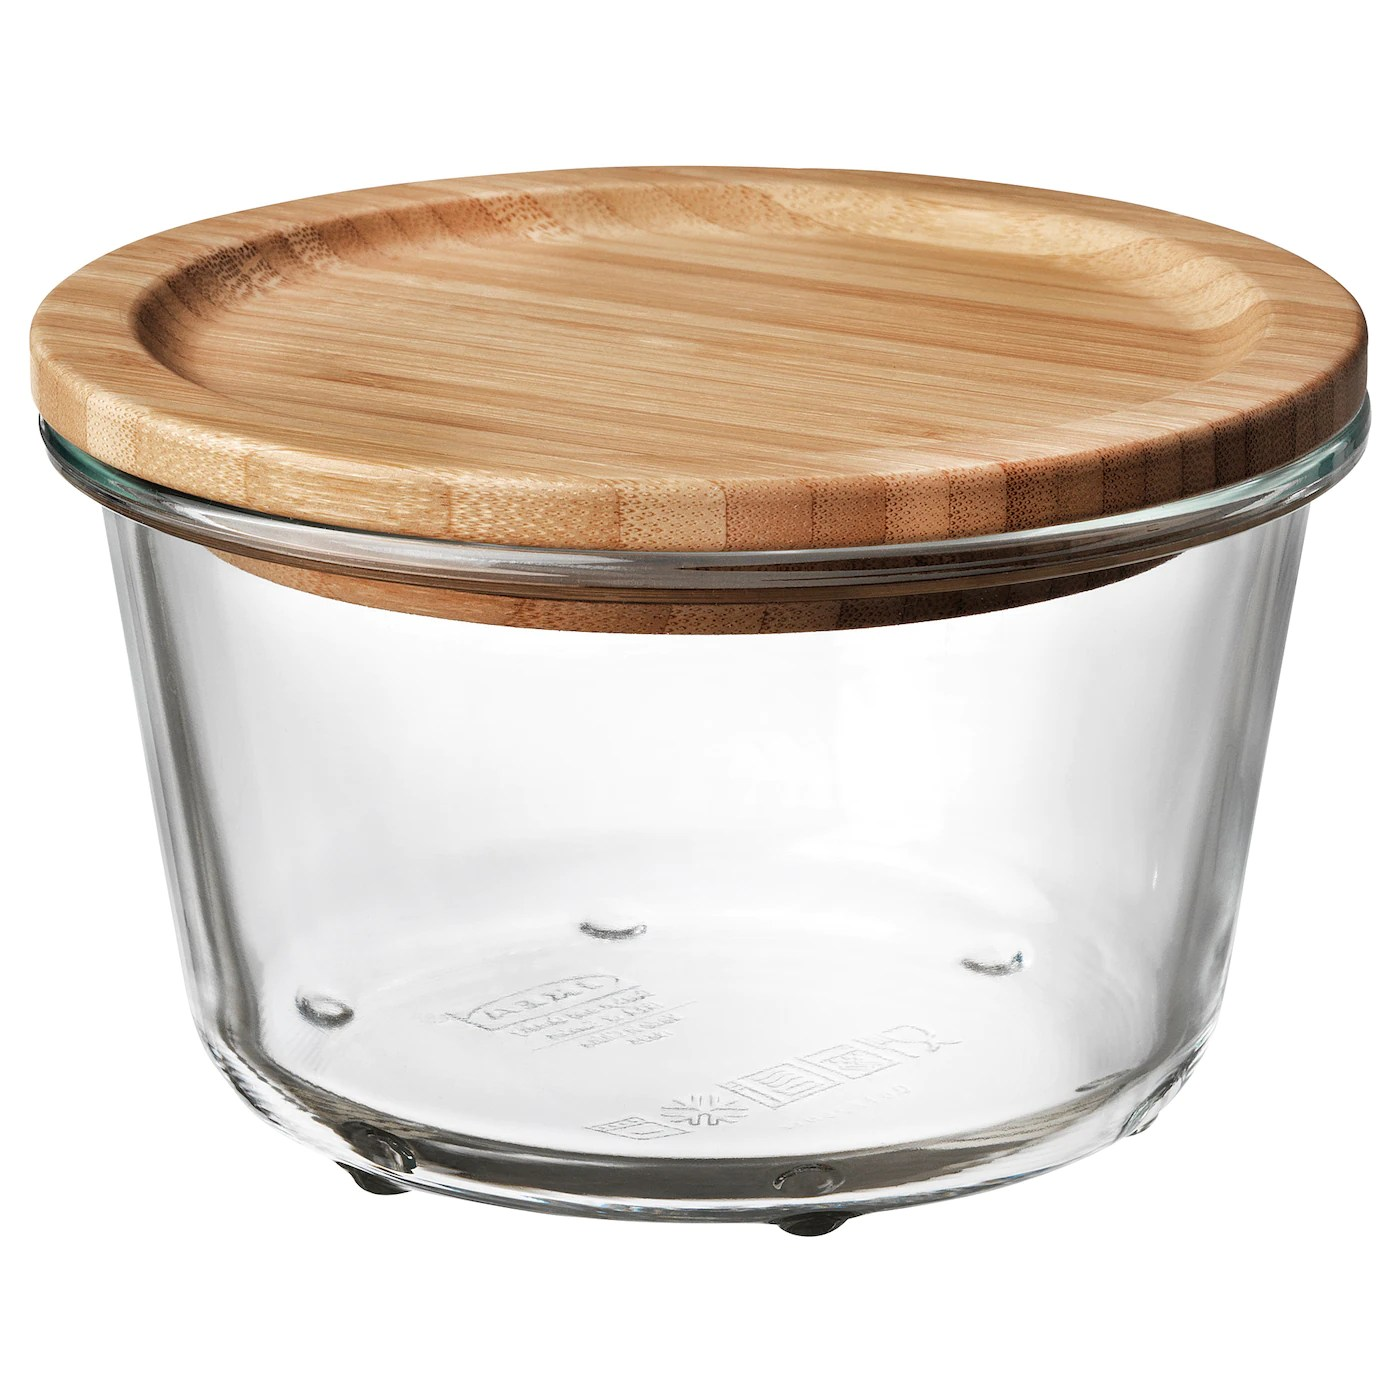 ikea 365 boite de conservation rond verre bambou 600 ml